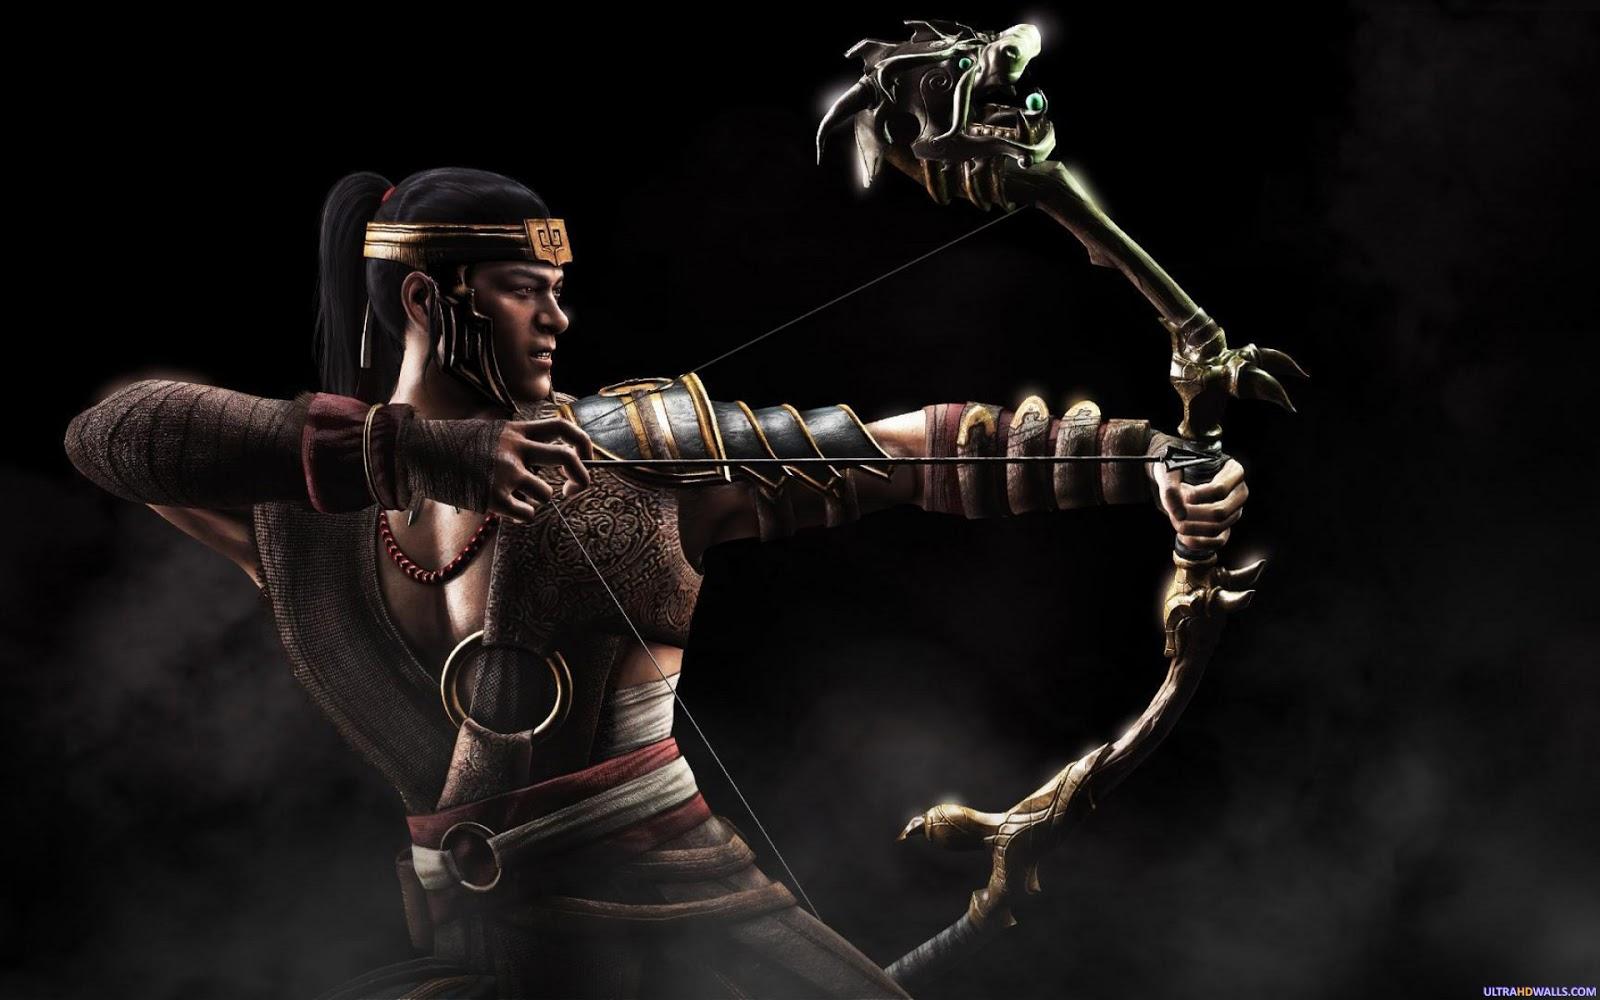 Mortal Kombat X Game Wallpapers Set 2 Hd Wallpaper Jos